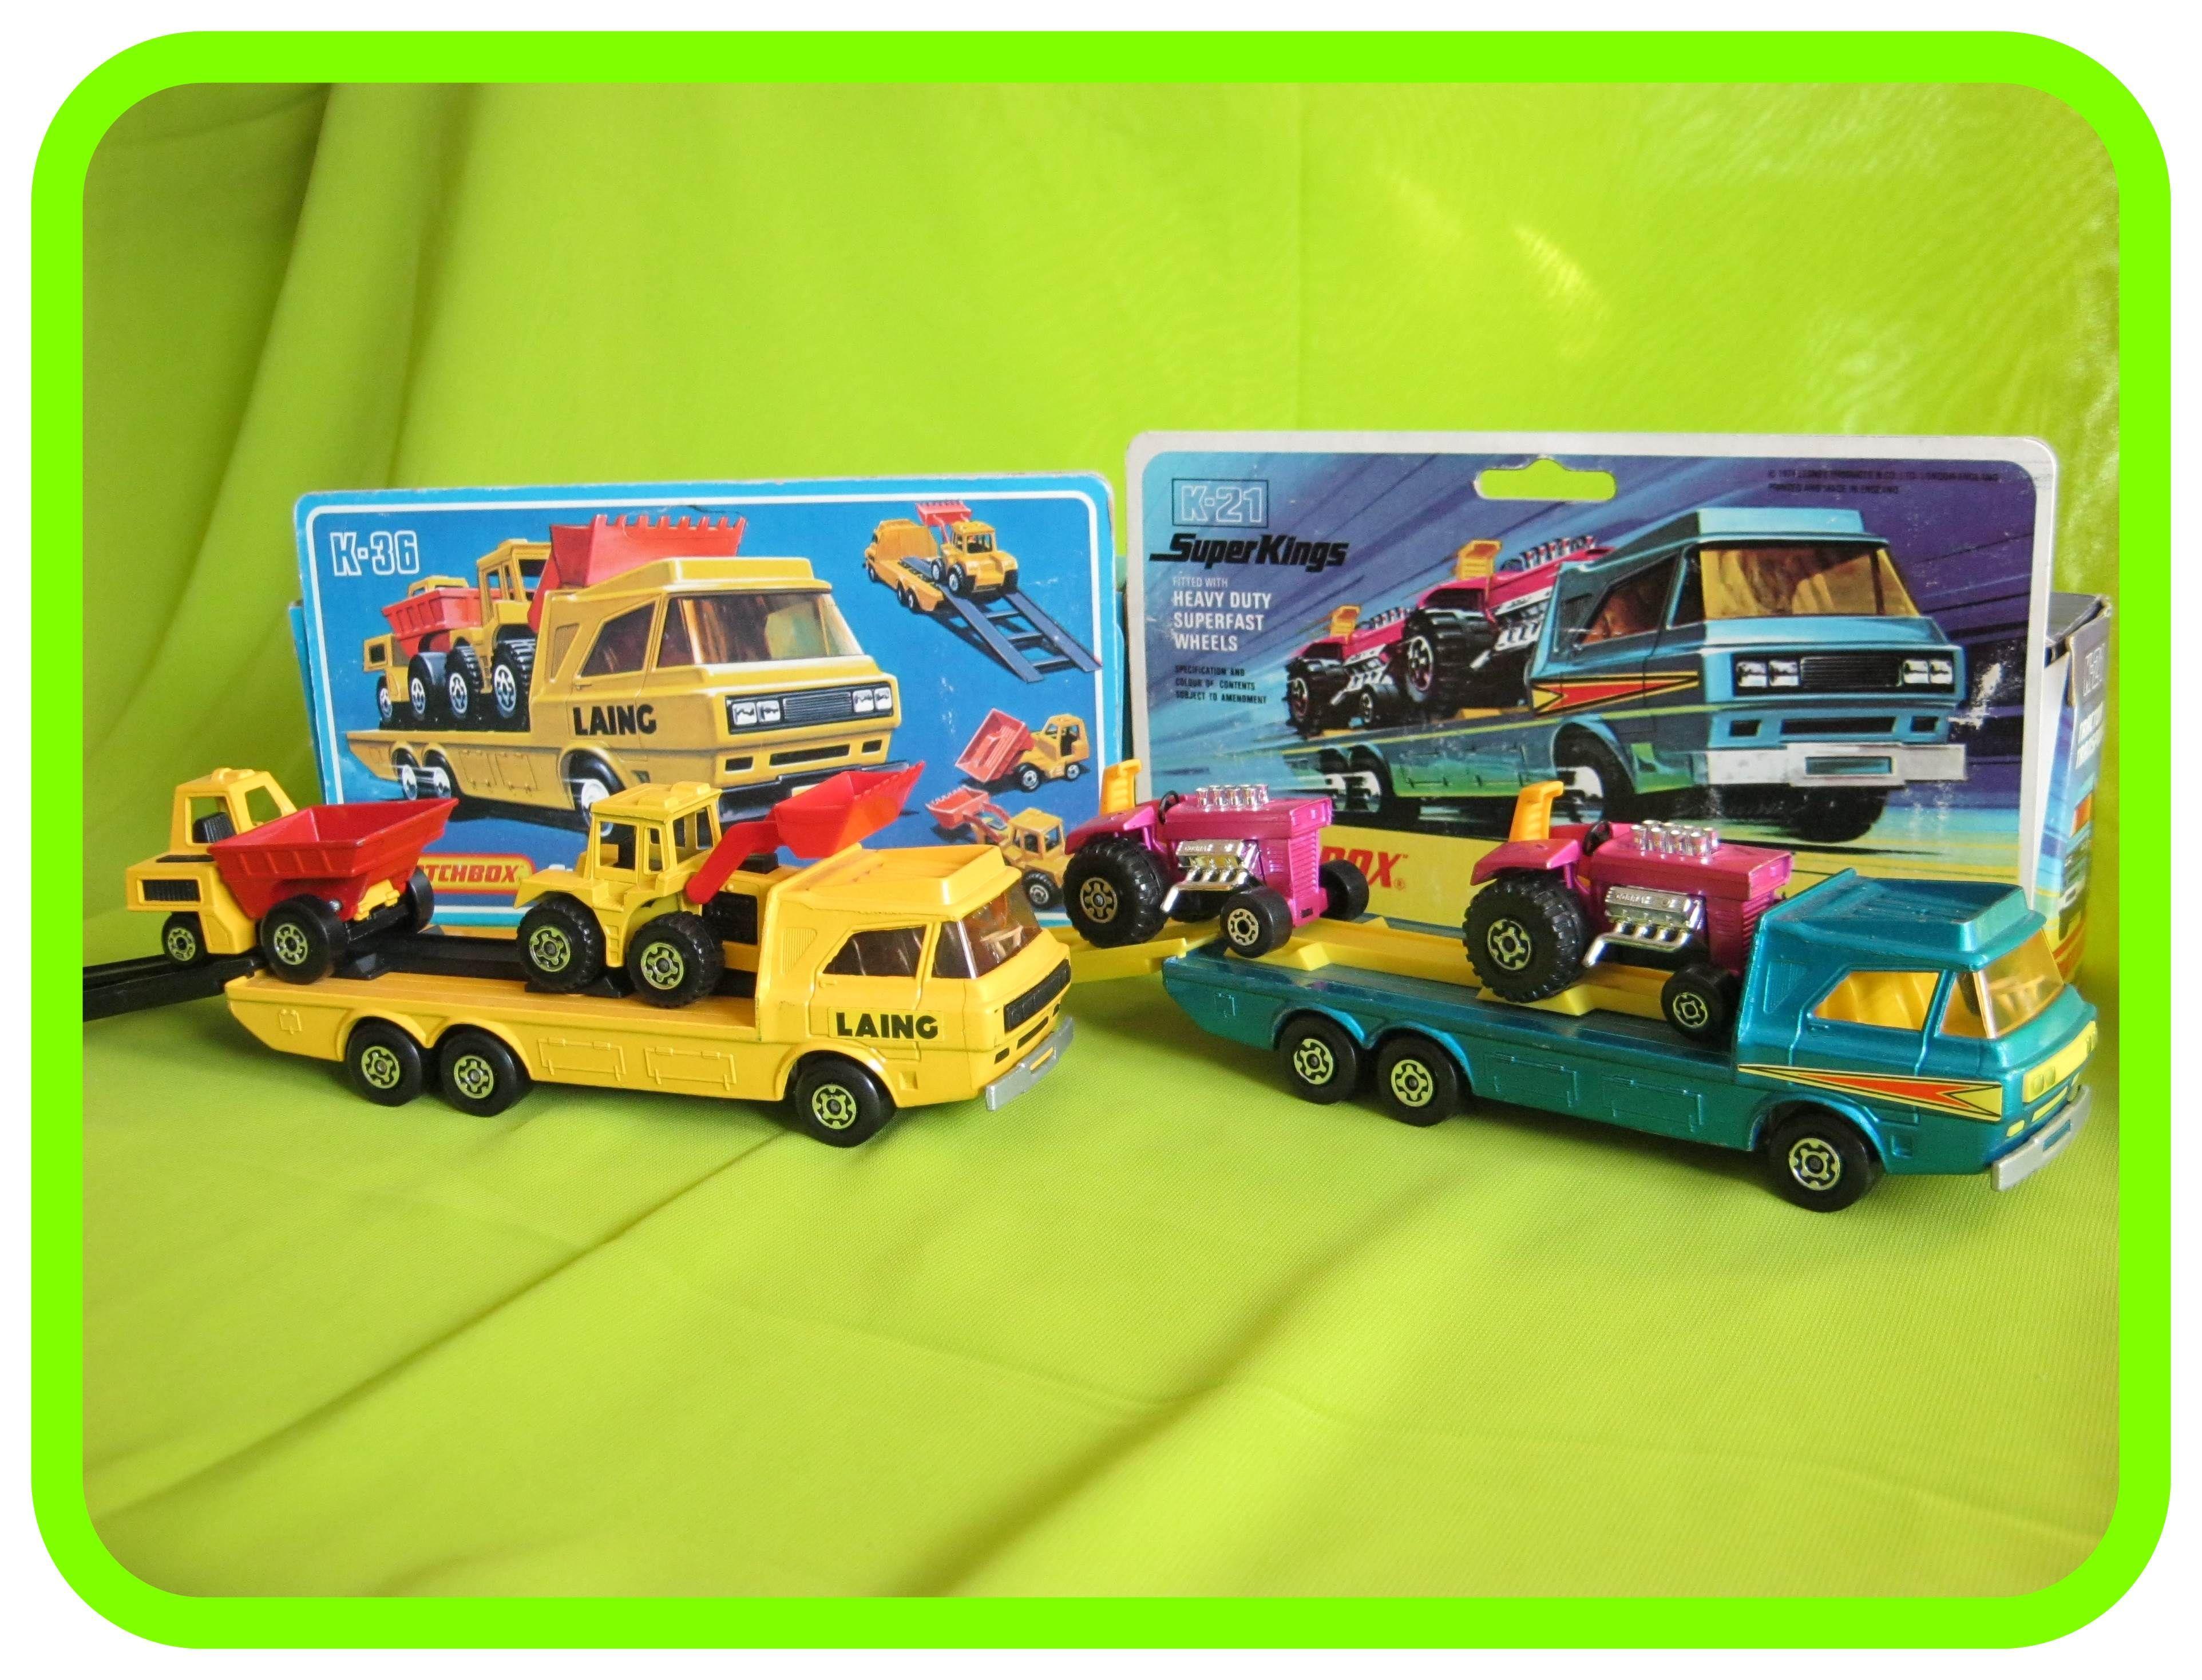 K36 Laing Construction Transporter K21 Tractor Transporter Mattel Hot Wheels Diecast Cars Matchbox